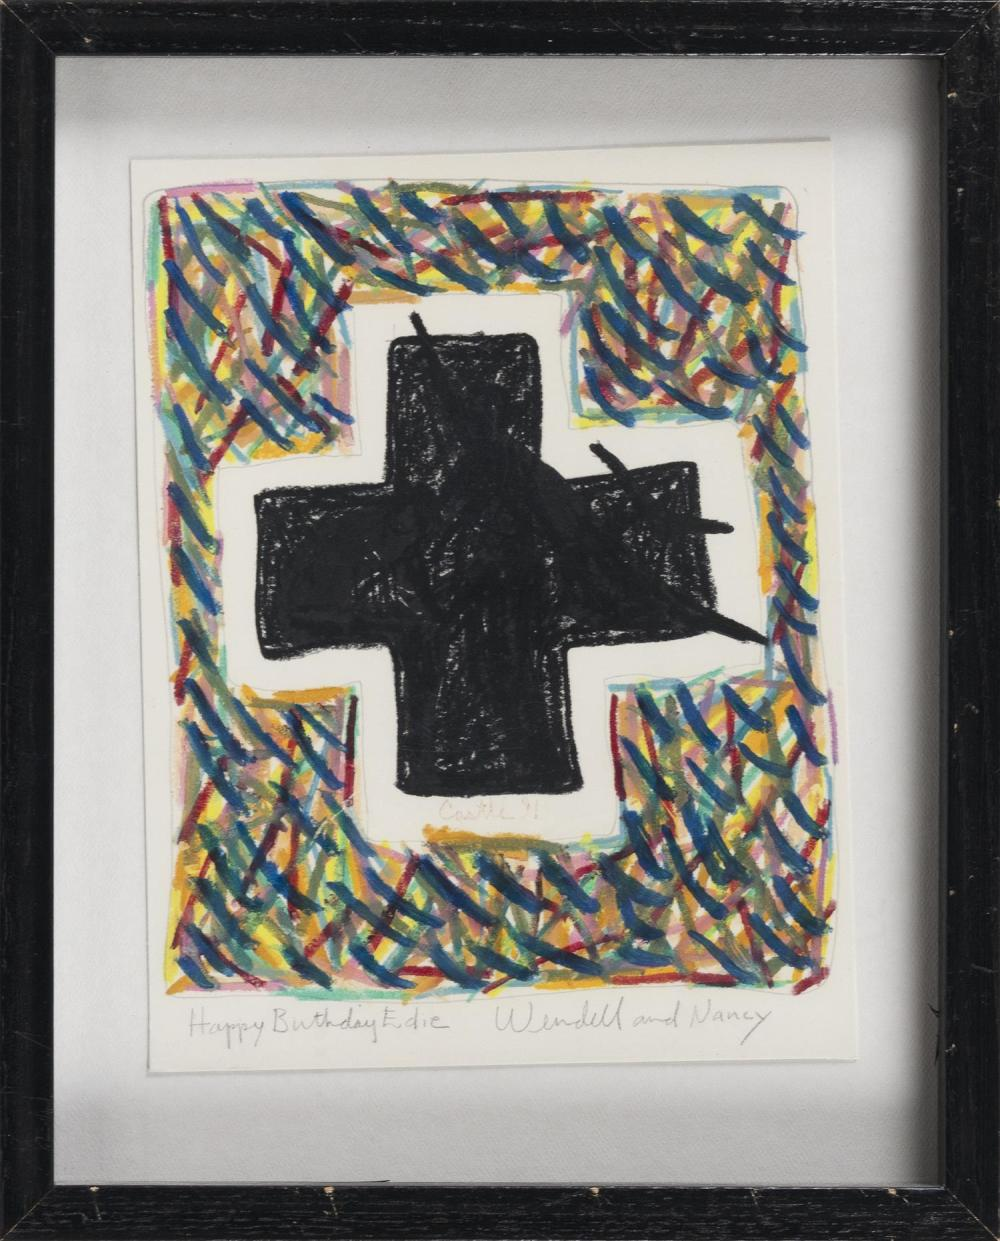 "WENDELL CASTLE, New York/Kansas, 1932-2018, Birthday card., Mixed media on paper, sheet size 11"" x 8.5"". Framed."